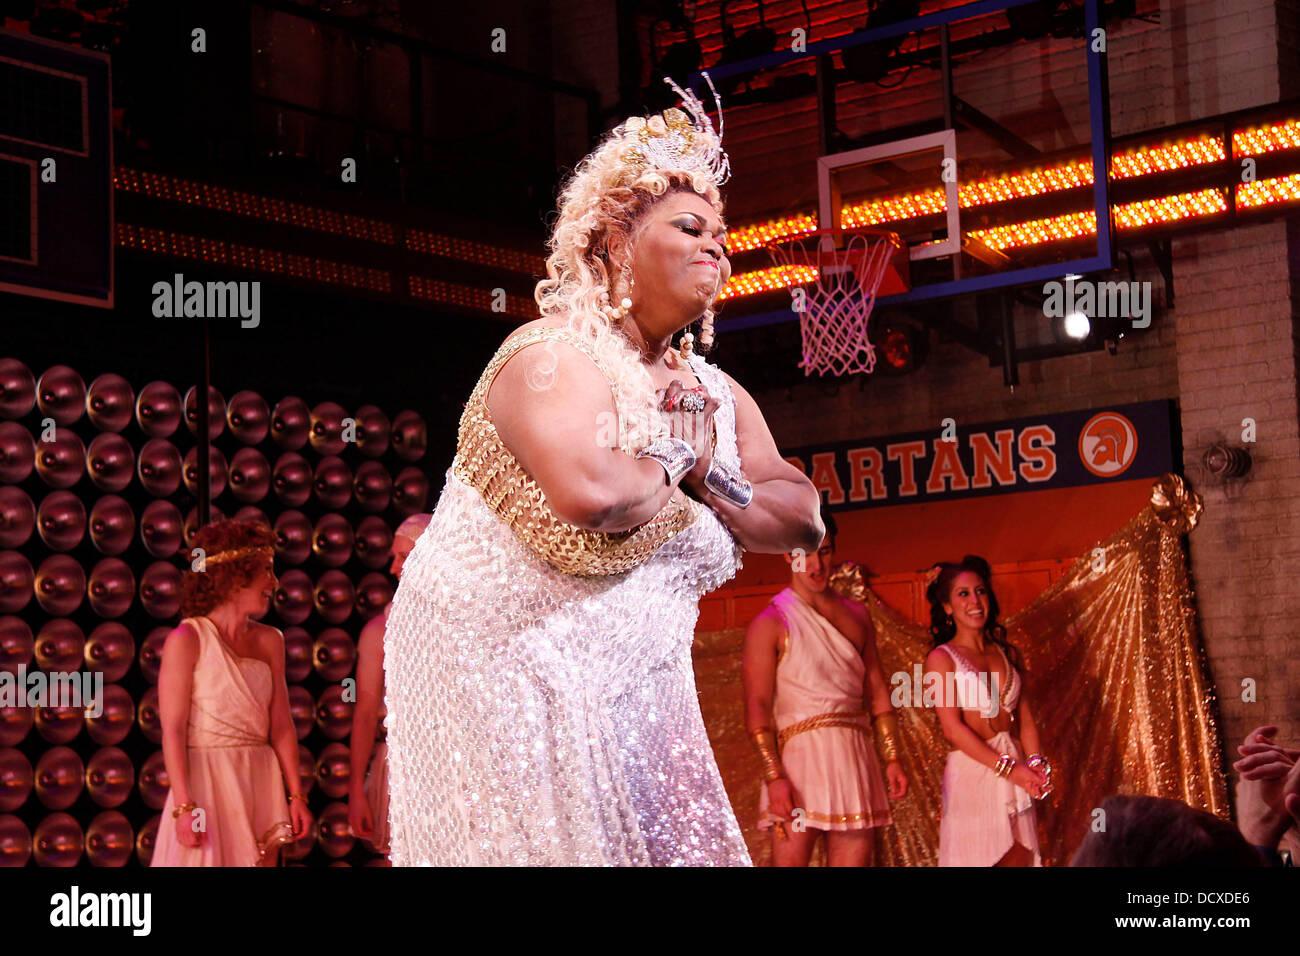 Queen Latifah,Chahat Khanna 2011 Hot nude Heather Craney,Colin Morgan (born 1986)